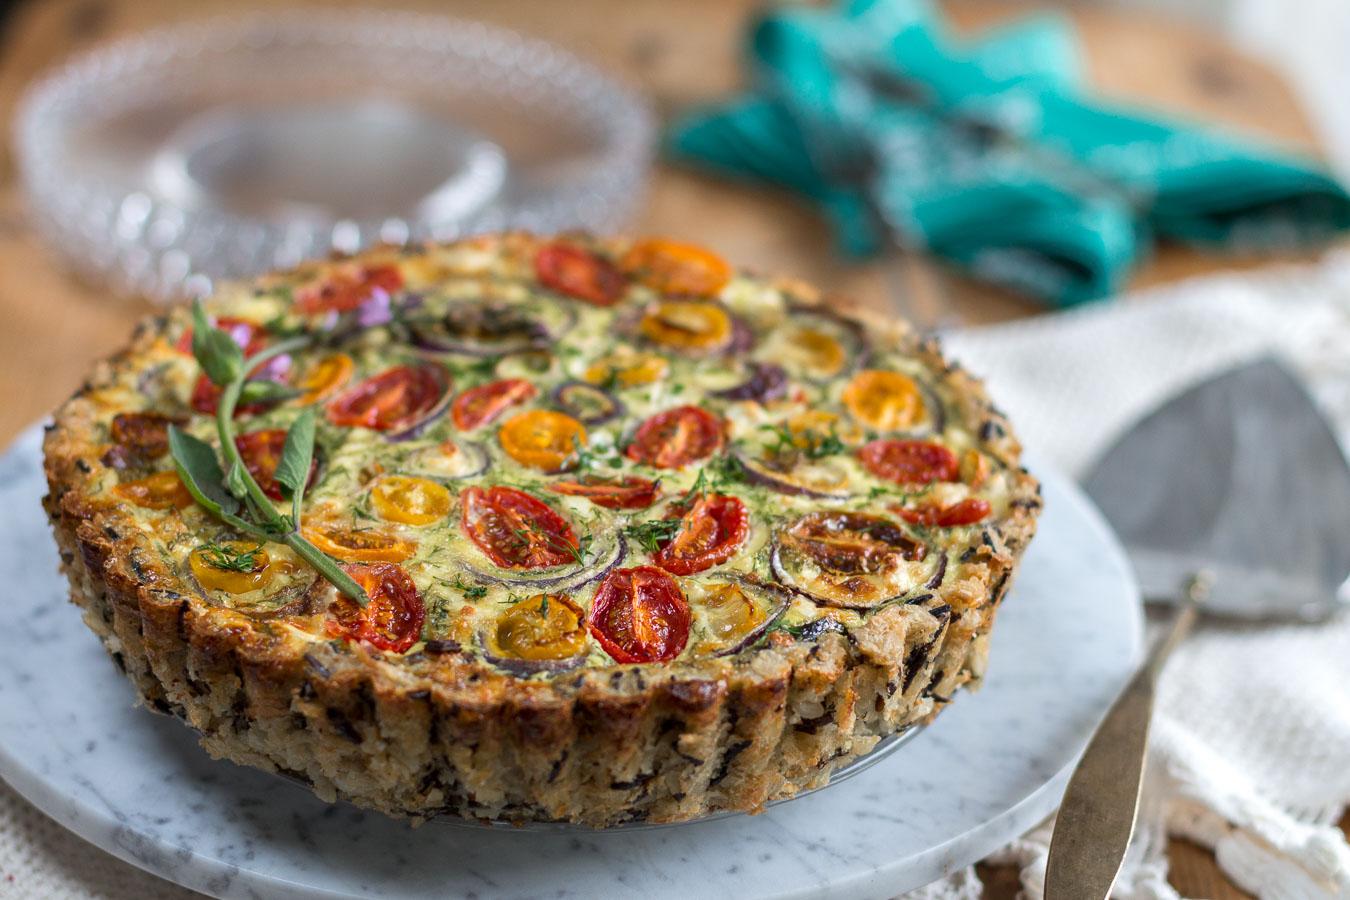 Spinach, Feta and Tomato Quiche with Wild & Brown Rice